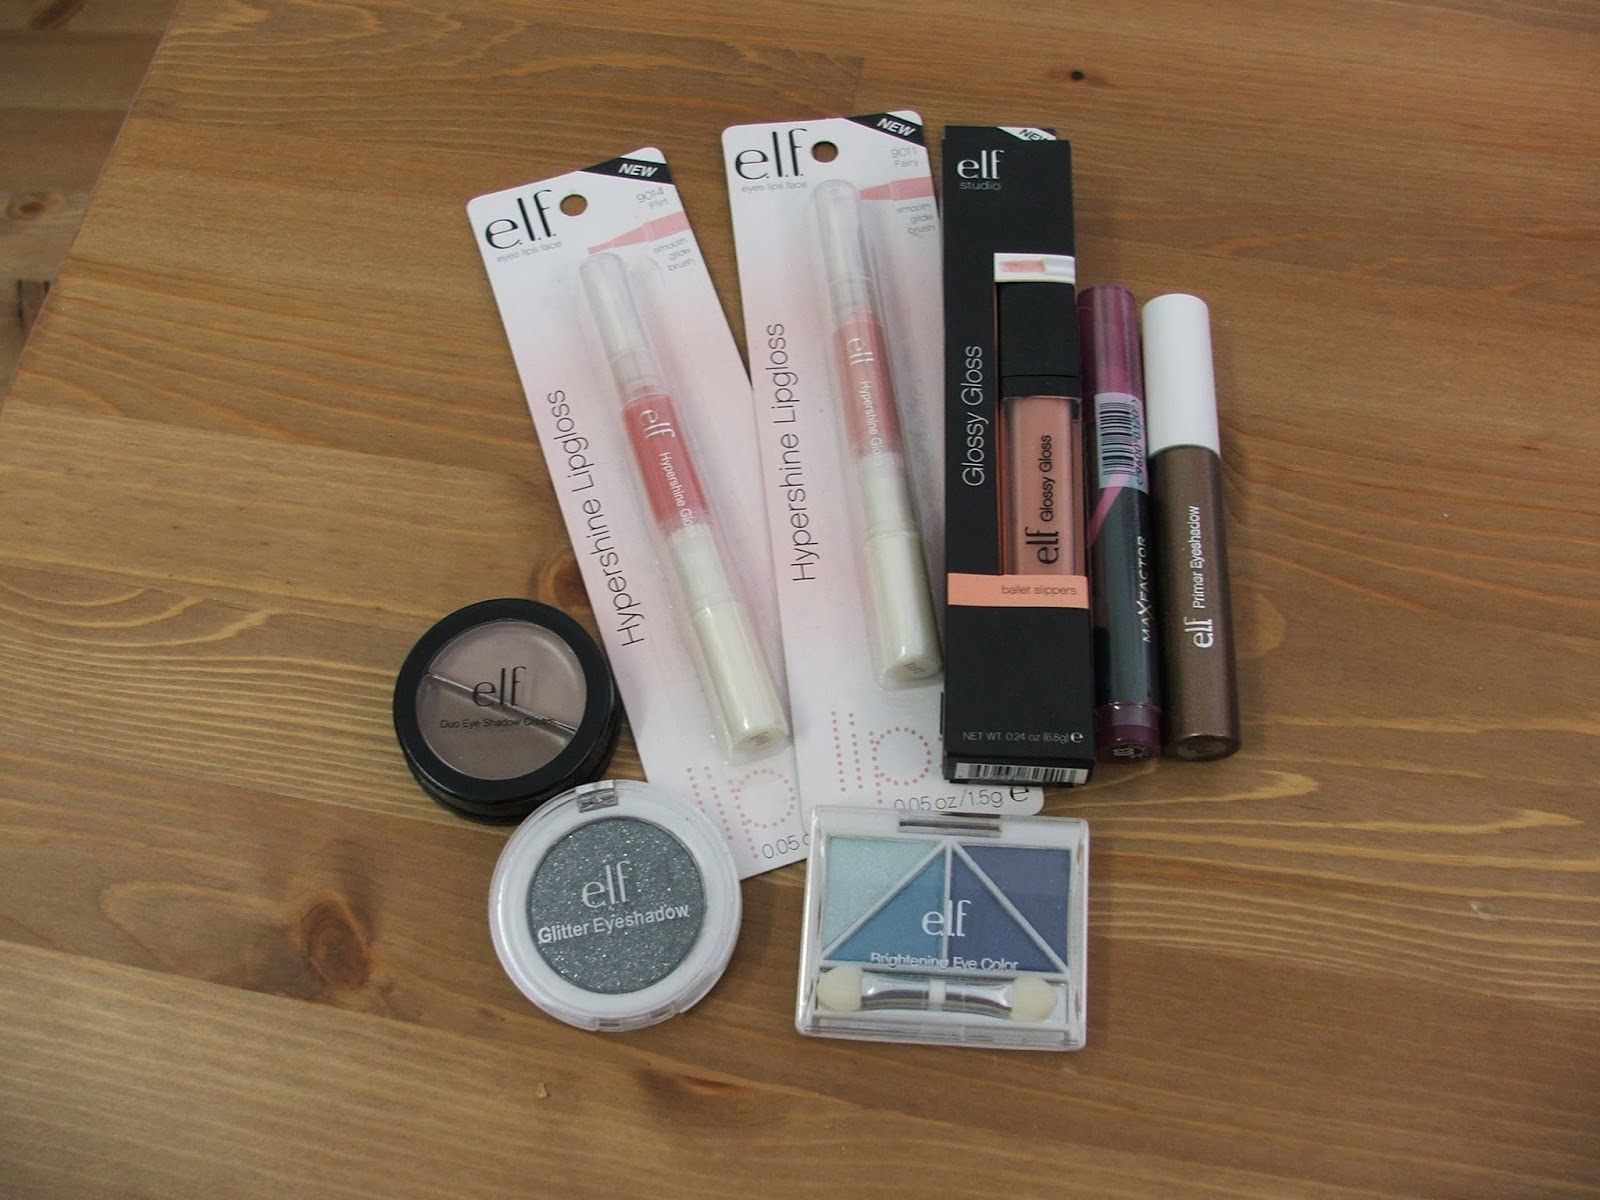 e.l.f Make-up Giveaway